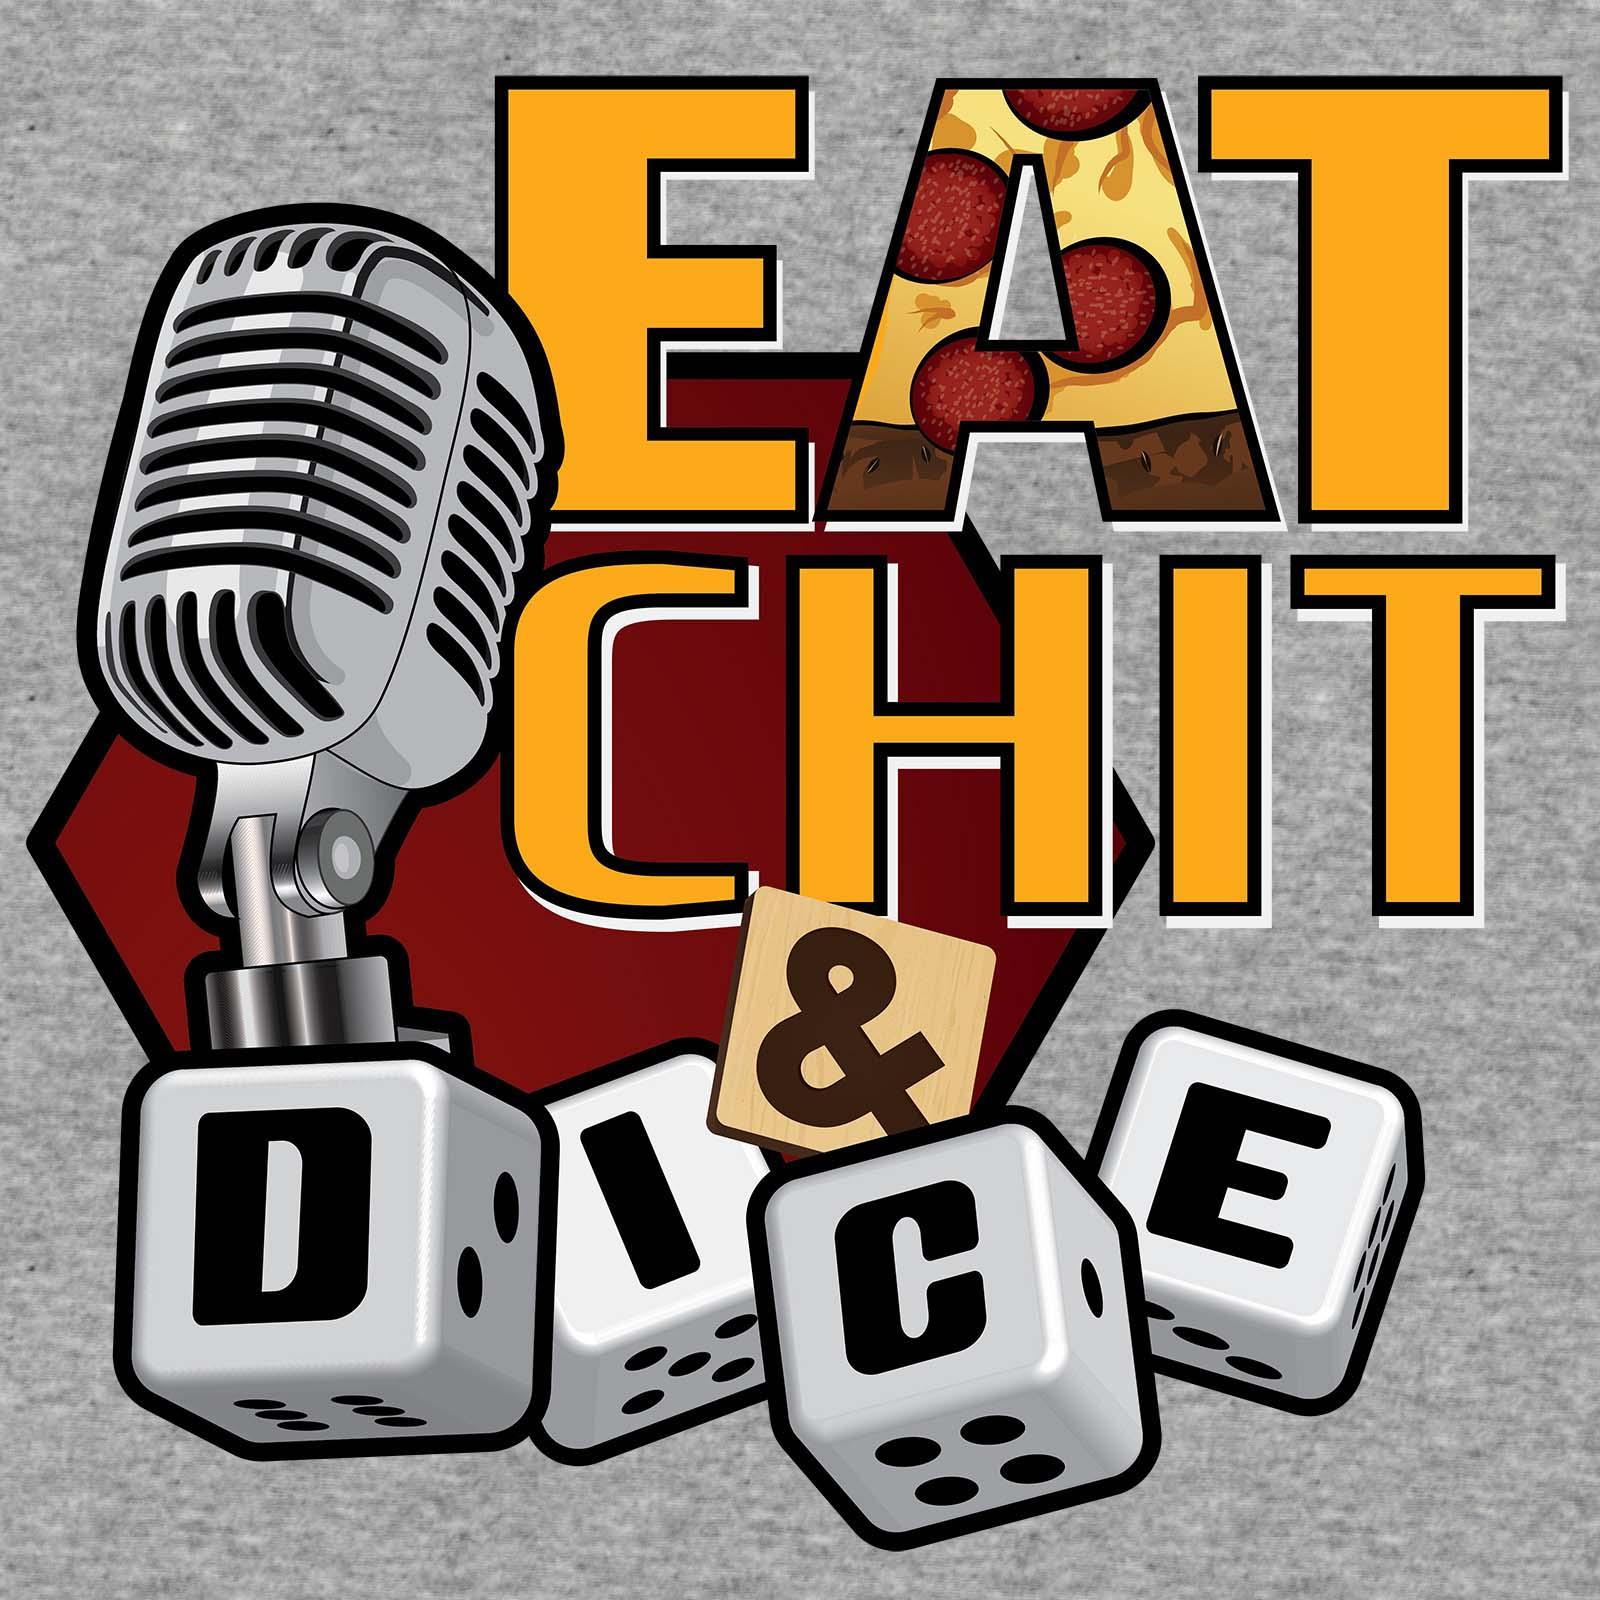 Eat Chit & Dice